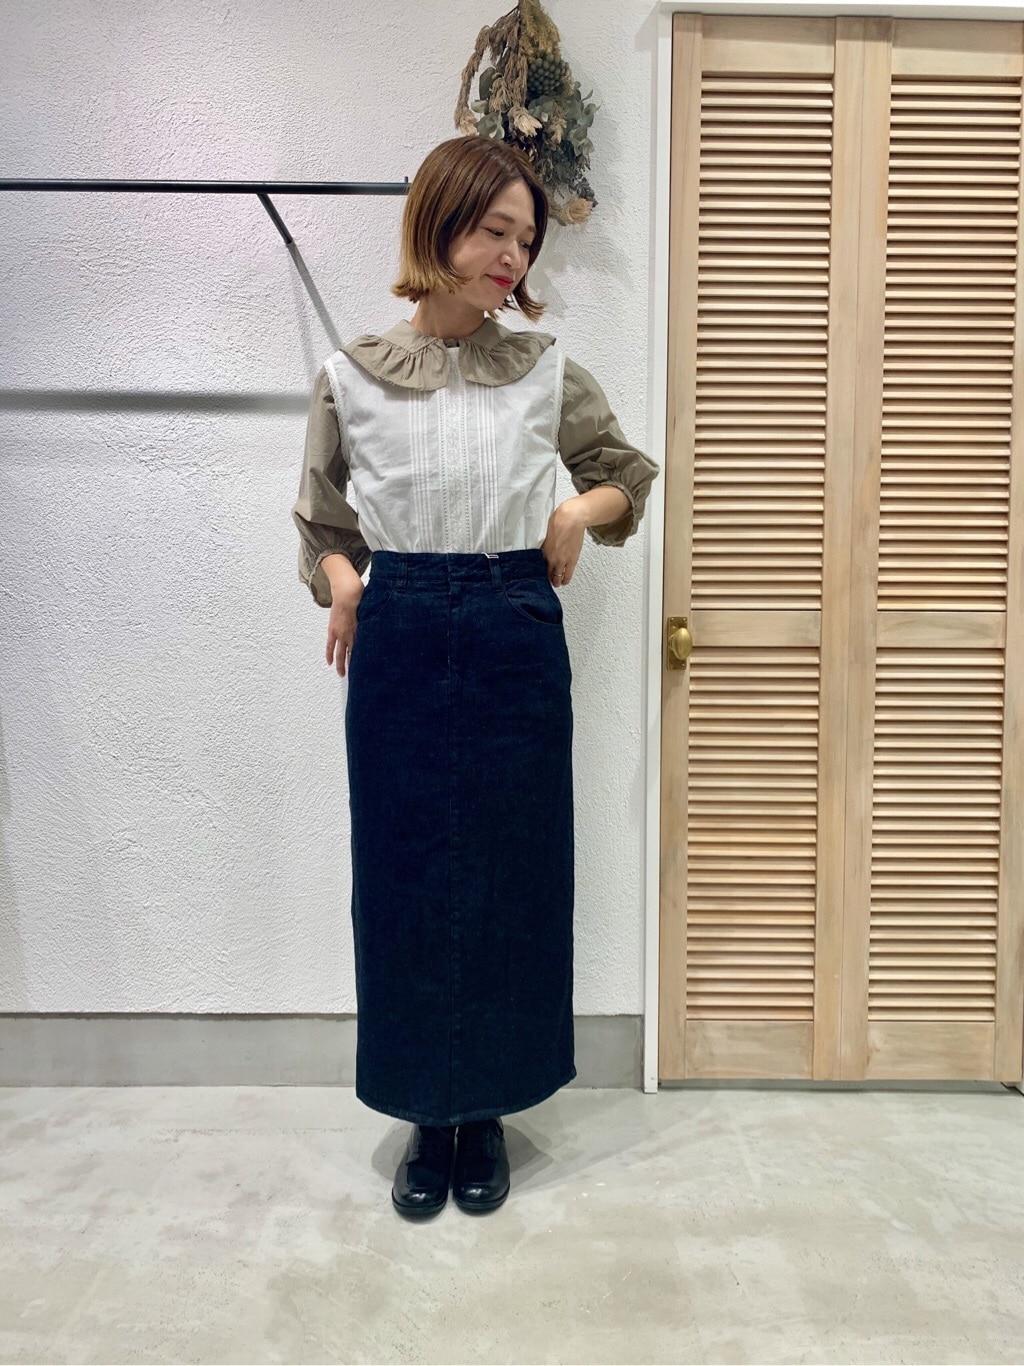 chambre de charme 横浜ジョイナス 身長:160cm 2020.07.22